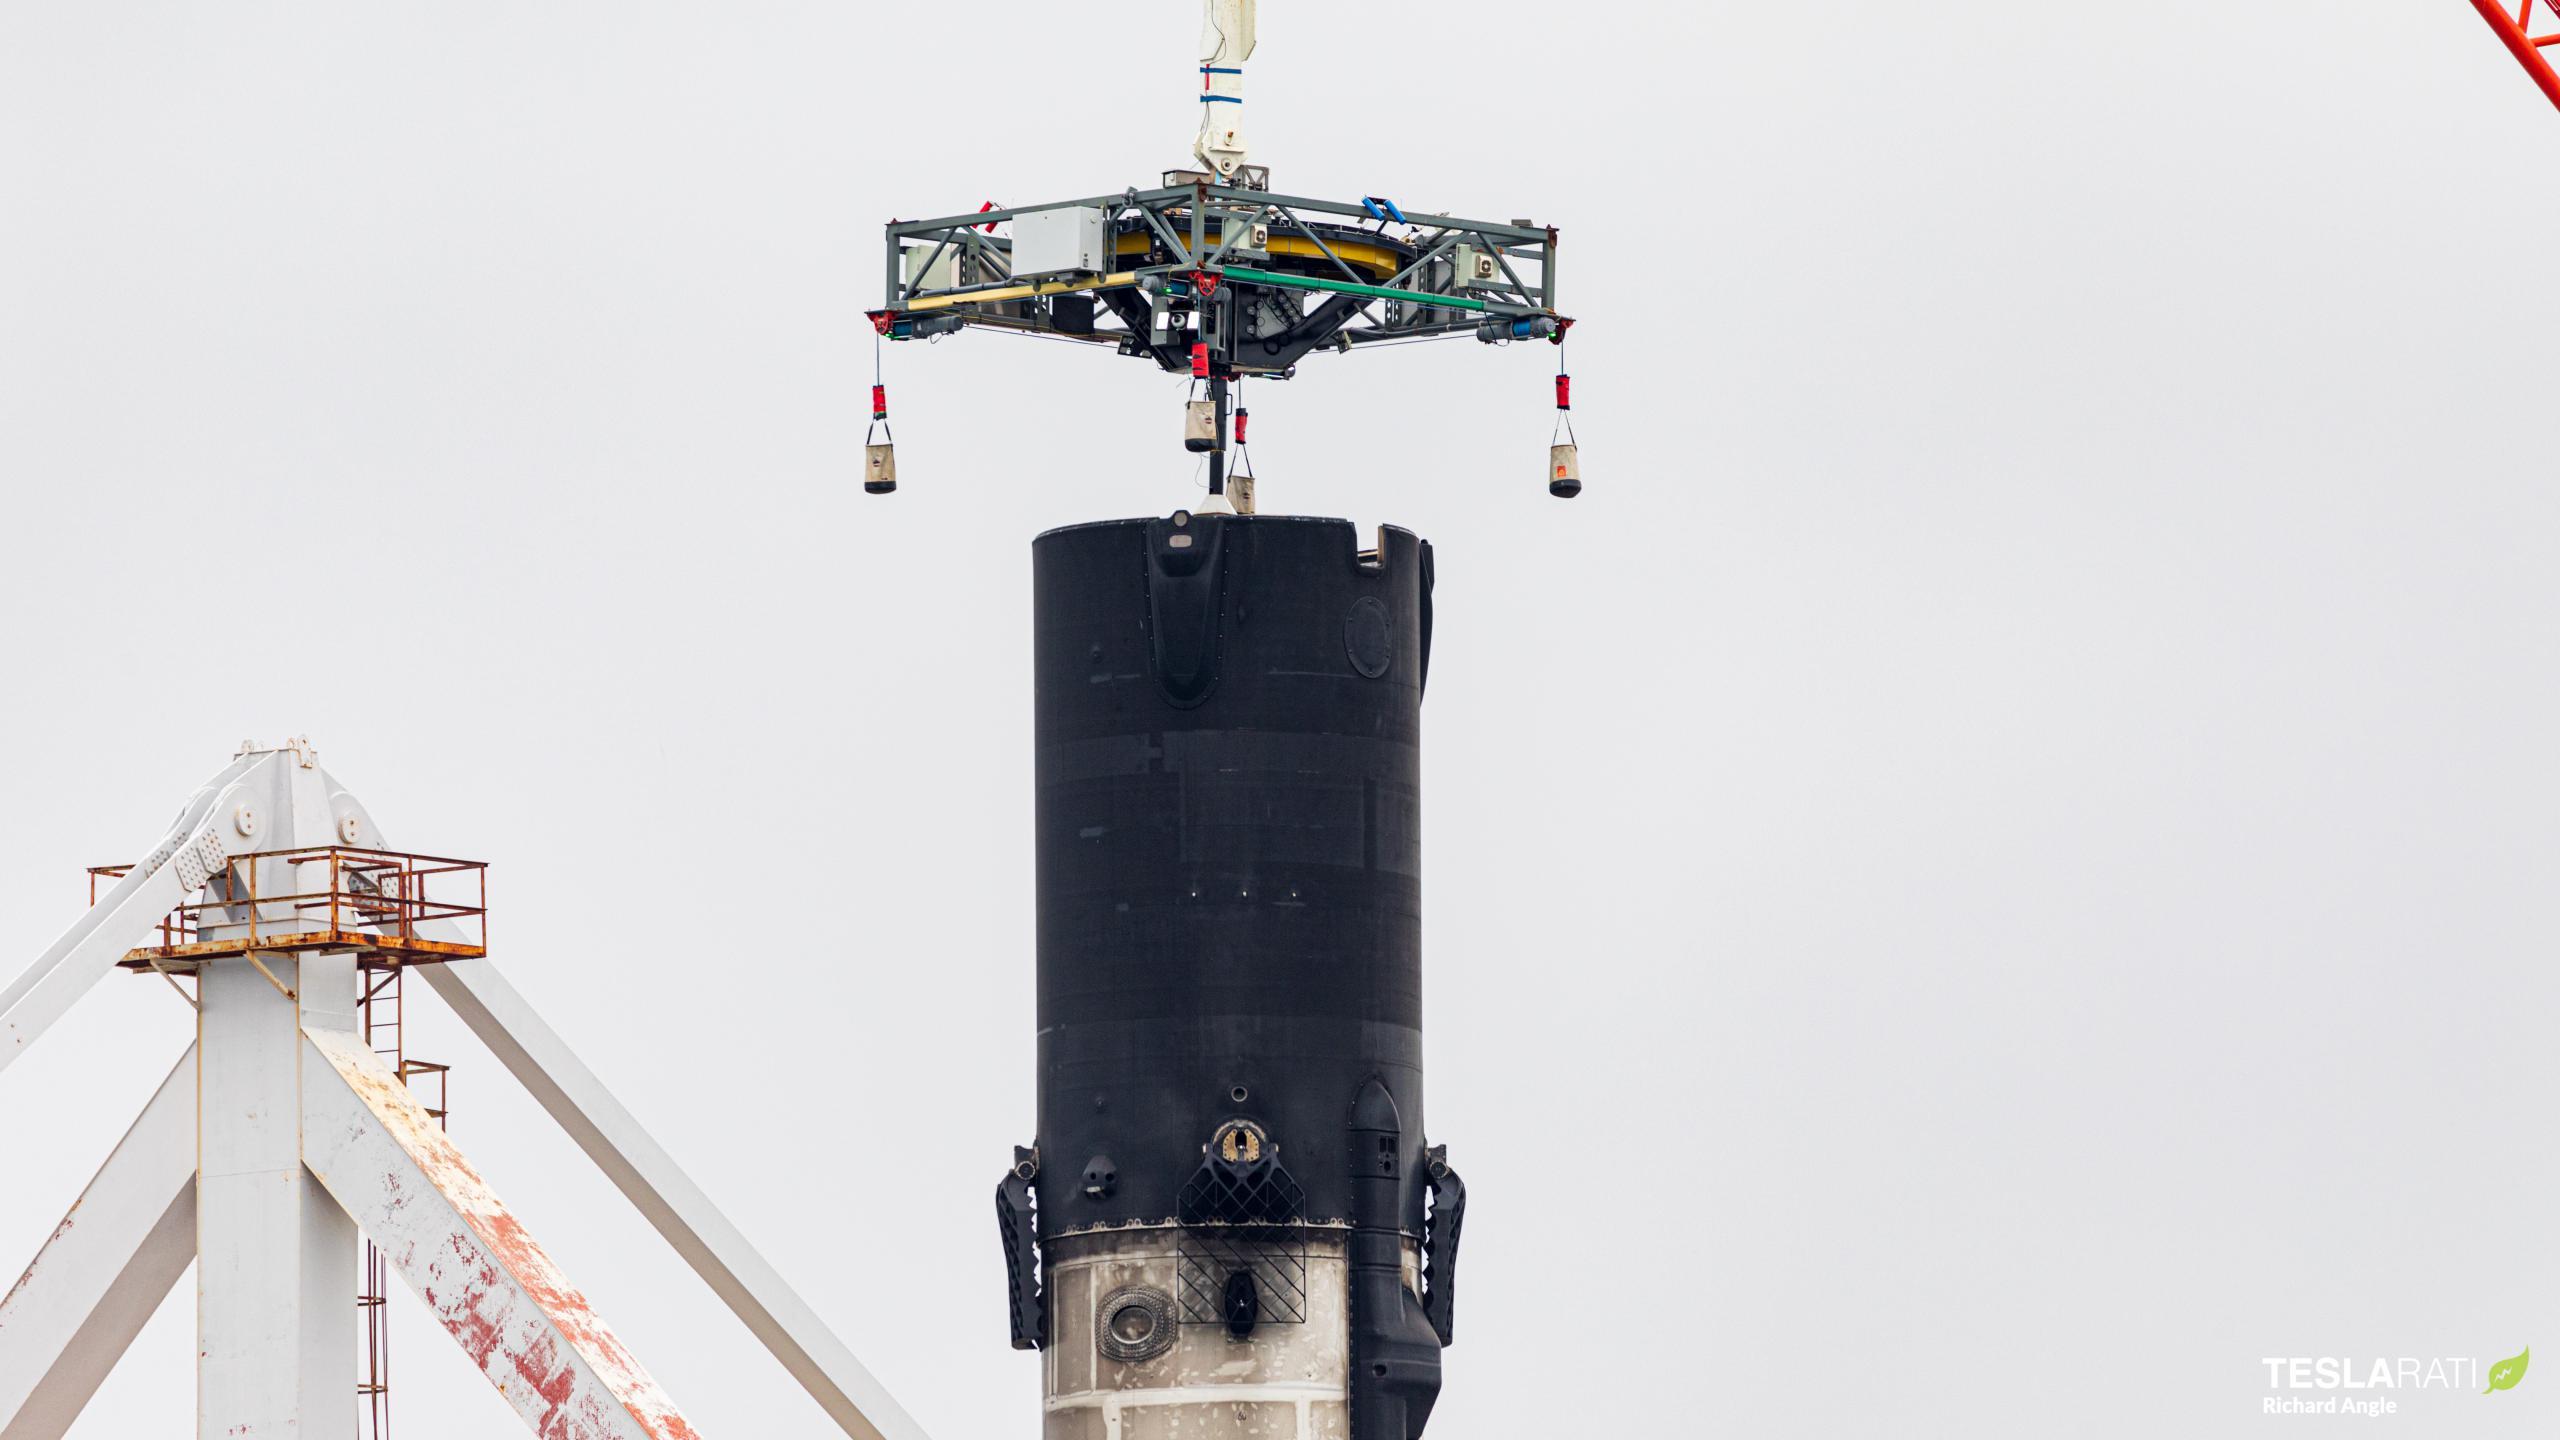 Turksat 5A Falcon 9 B1060 011221 (Richard Angle) recovery (3) (c)